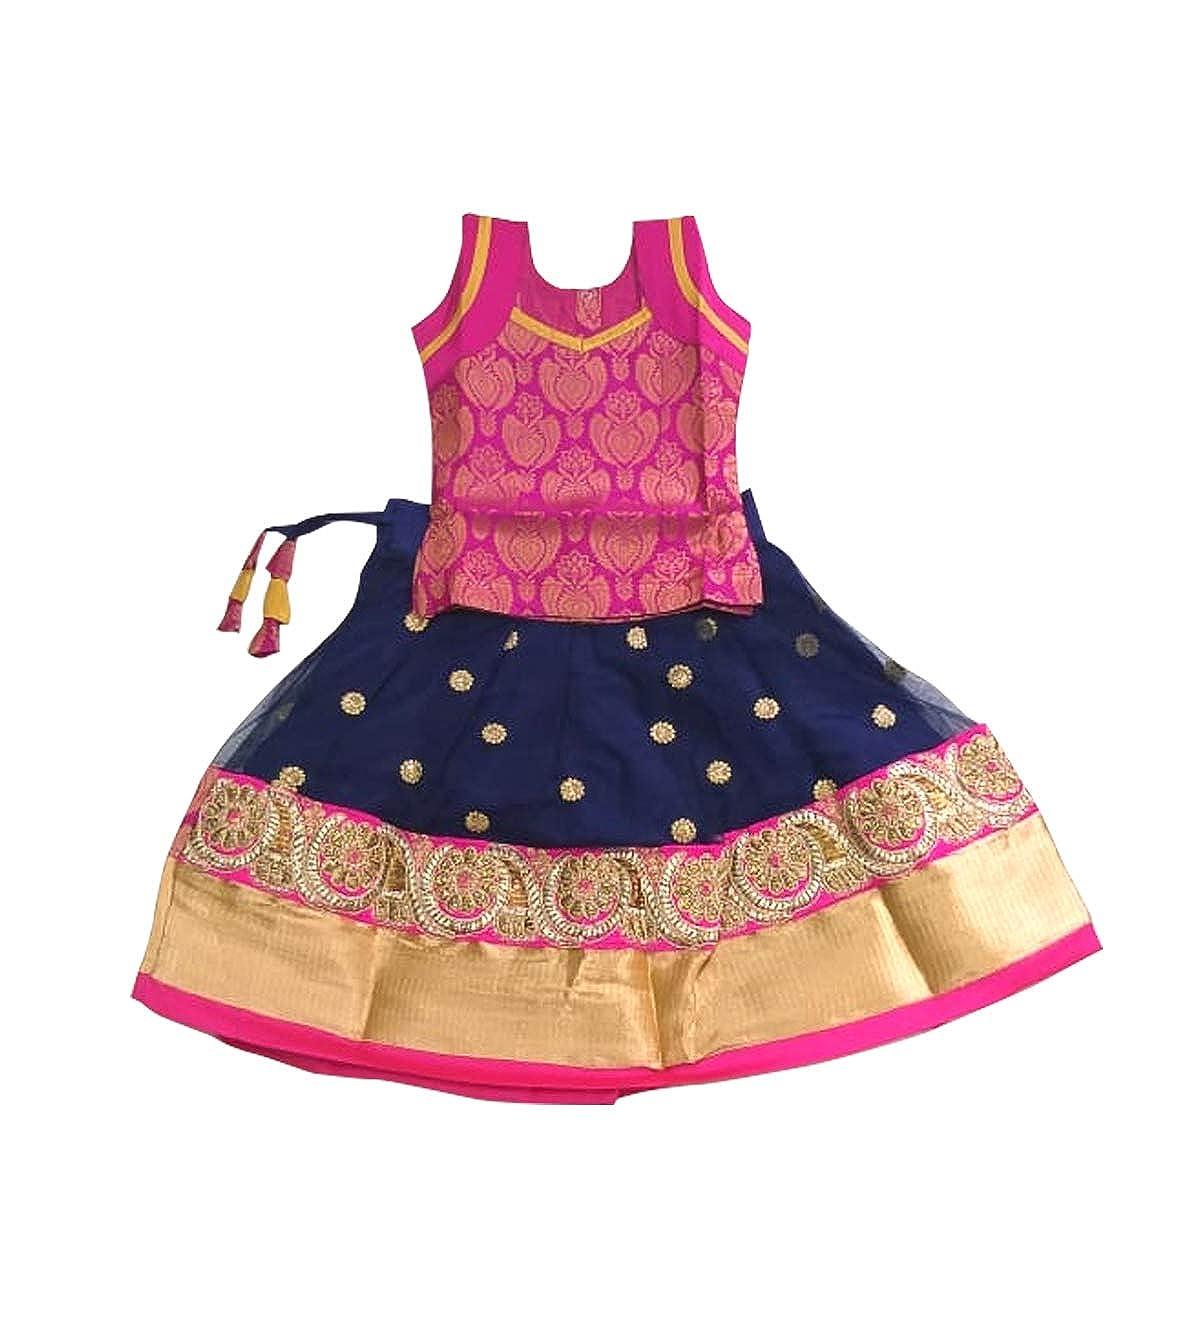 437490d2ec830 Pattu pavadai girls raw silk lehenga pink and navy blue years clothing  accessories jpg 1200x1320 Latest